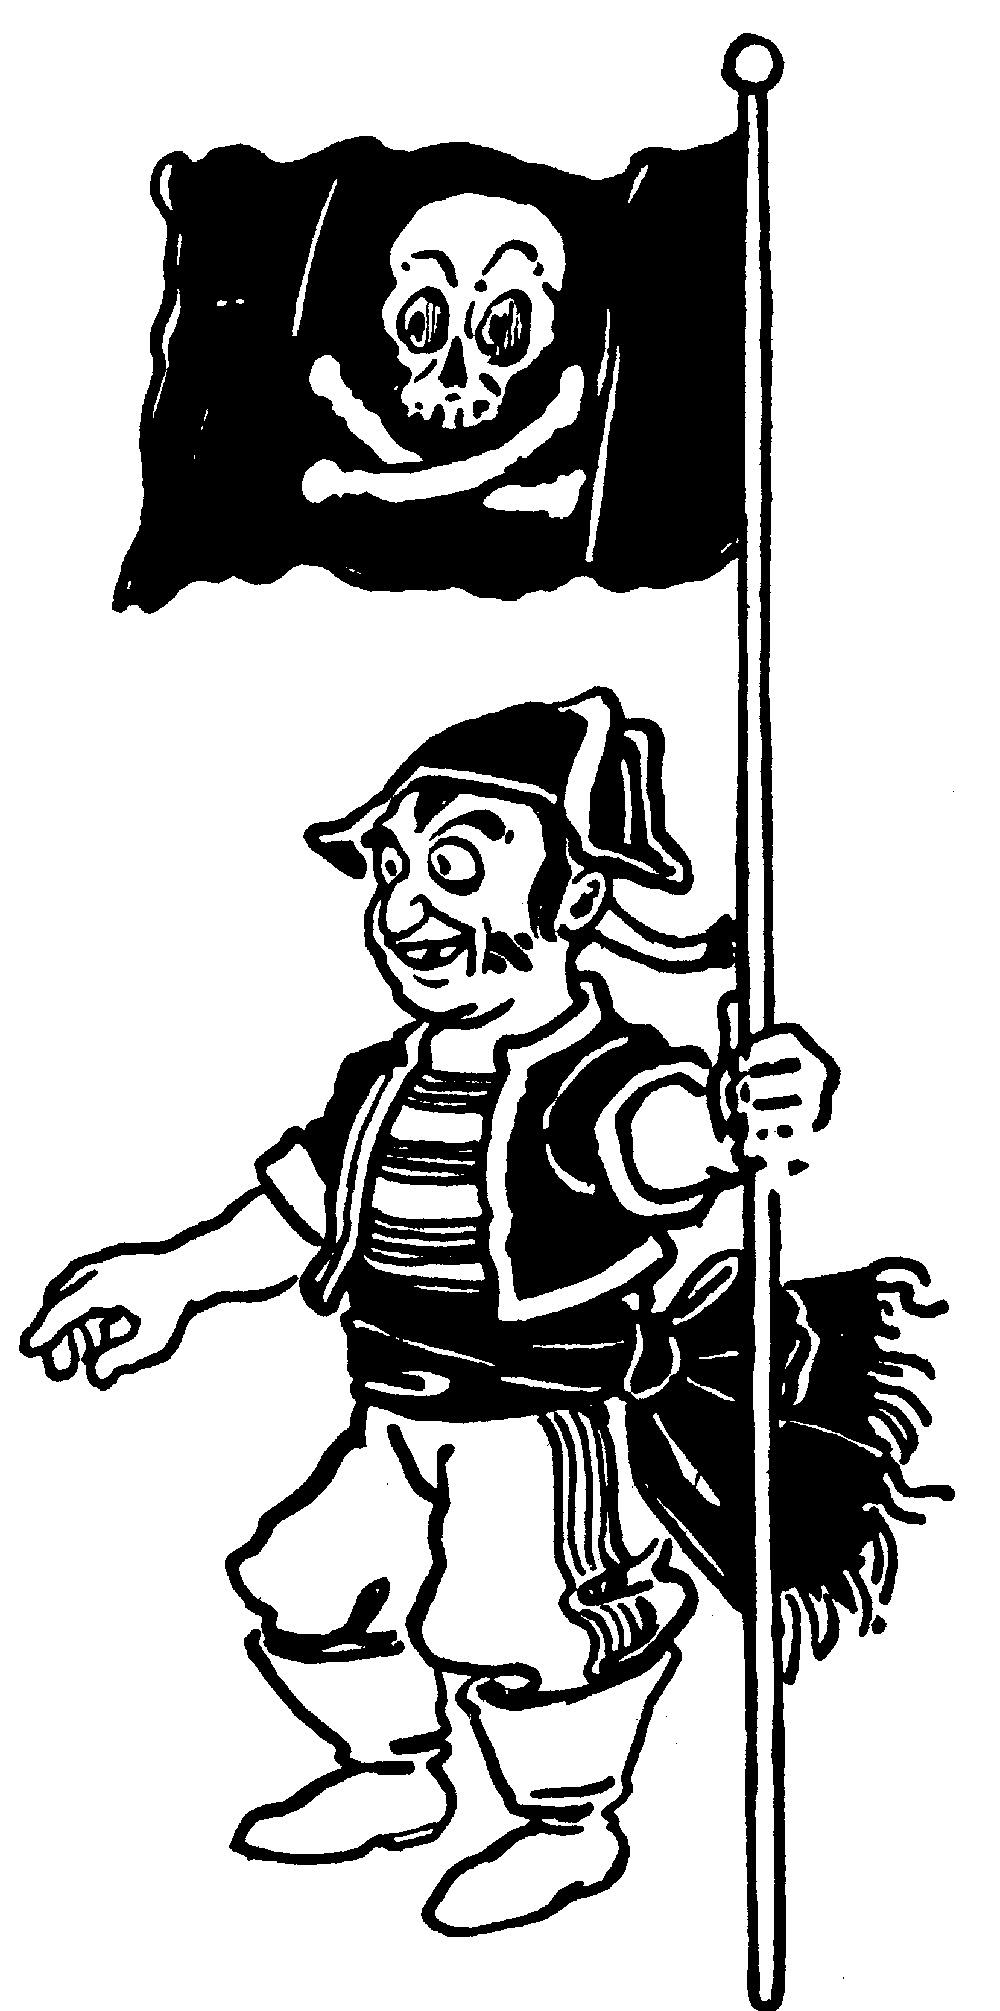 I'd sail the Spanish Main, The Master of the Seas